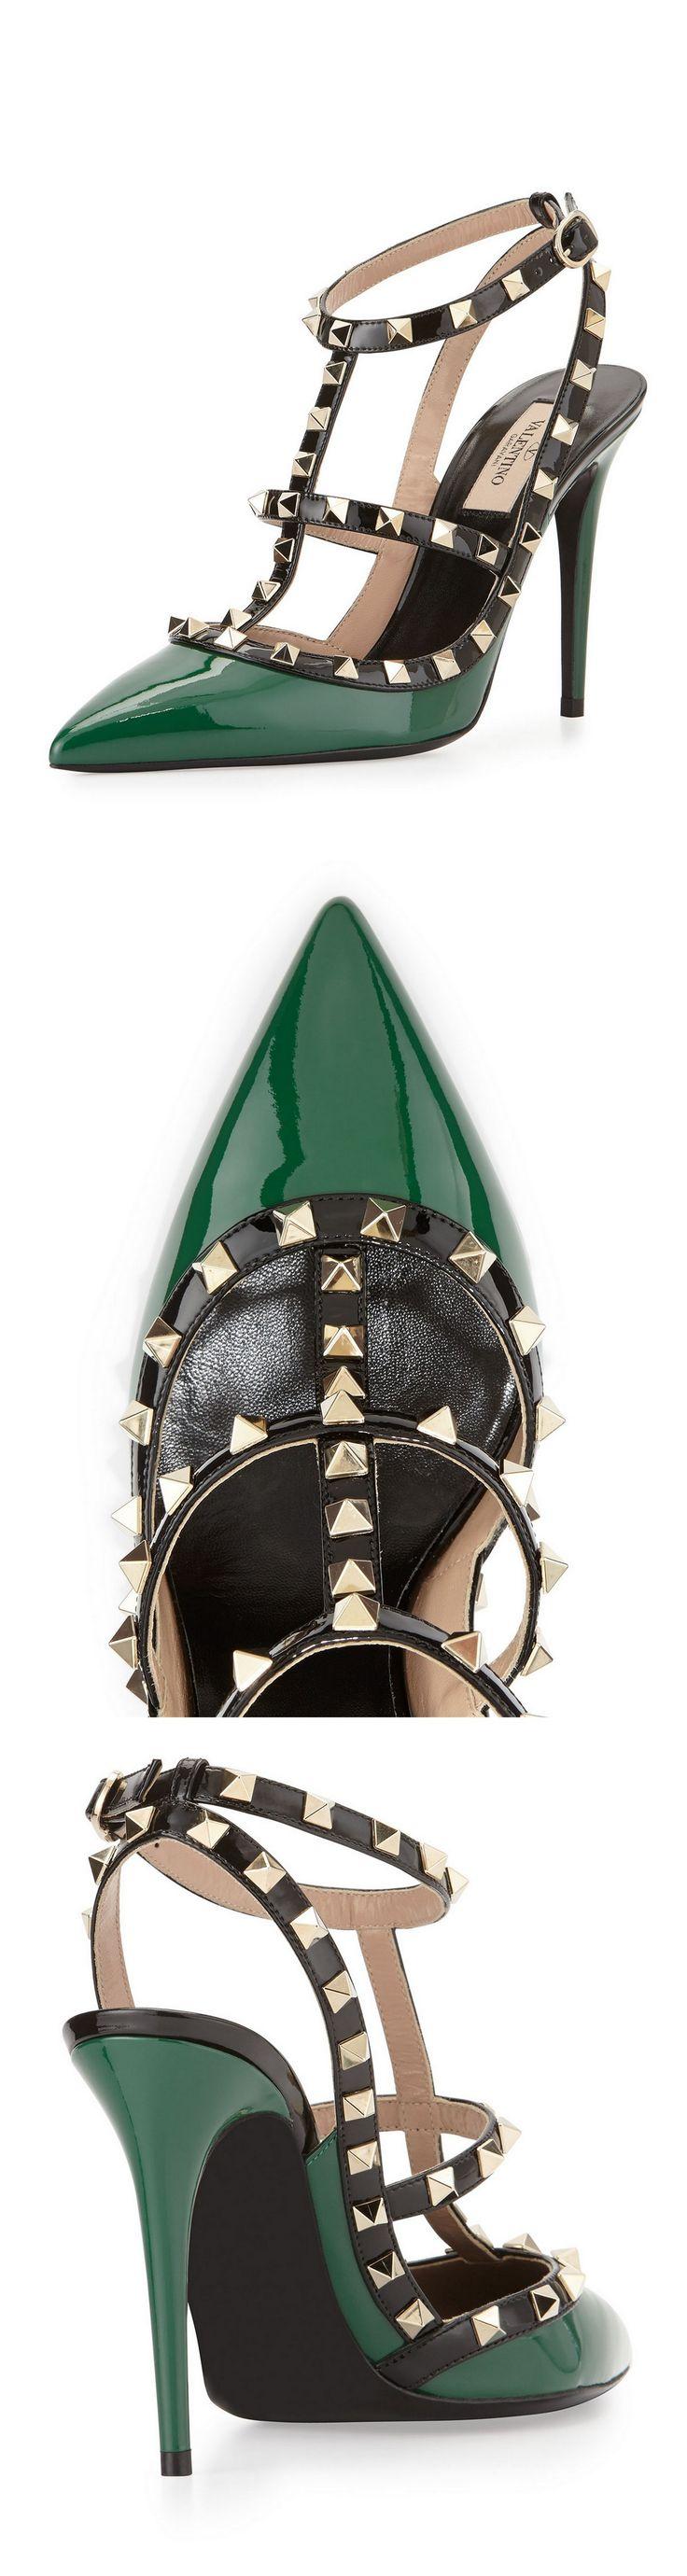 Valentino Rockstud Patent Leather Pump, Emerald Colorblock